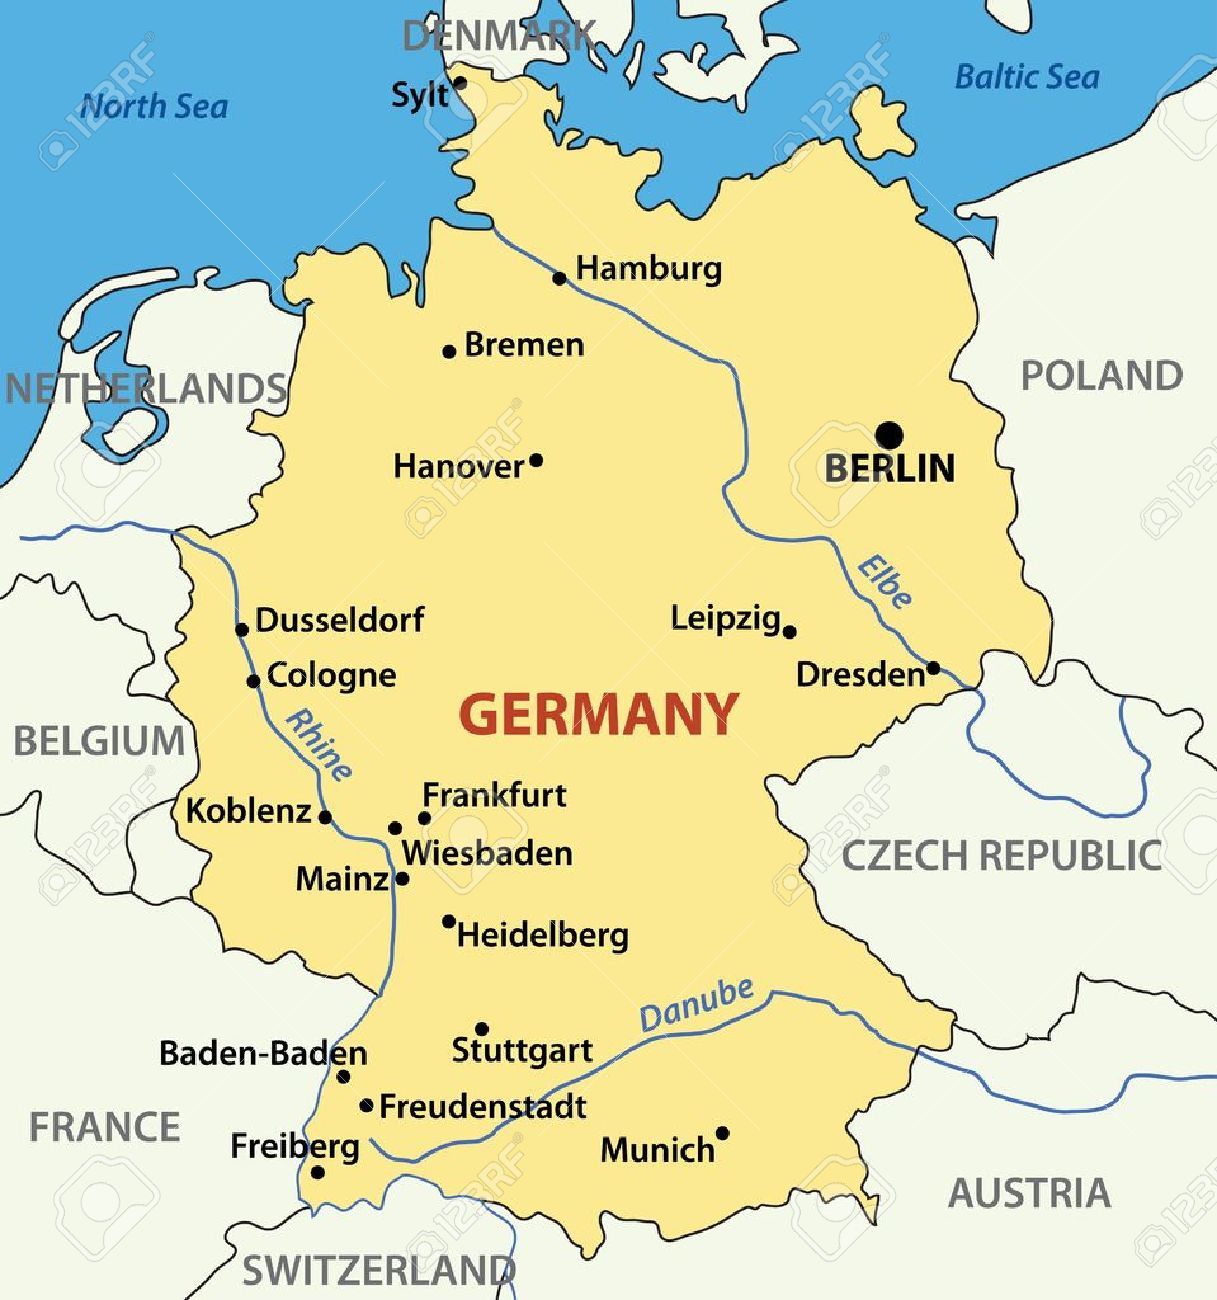 httpspreviews123rfimagespavalenapavalen – Map of German Lander